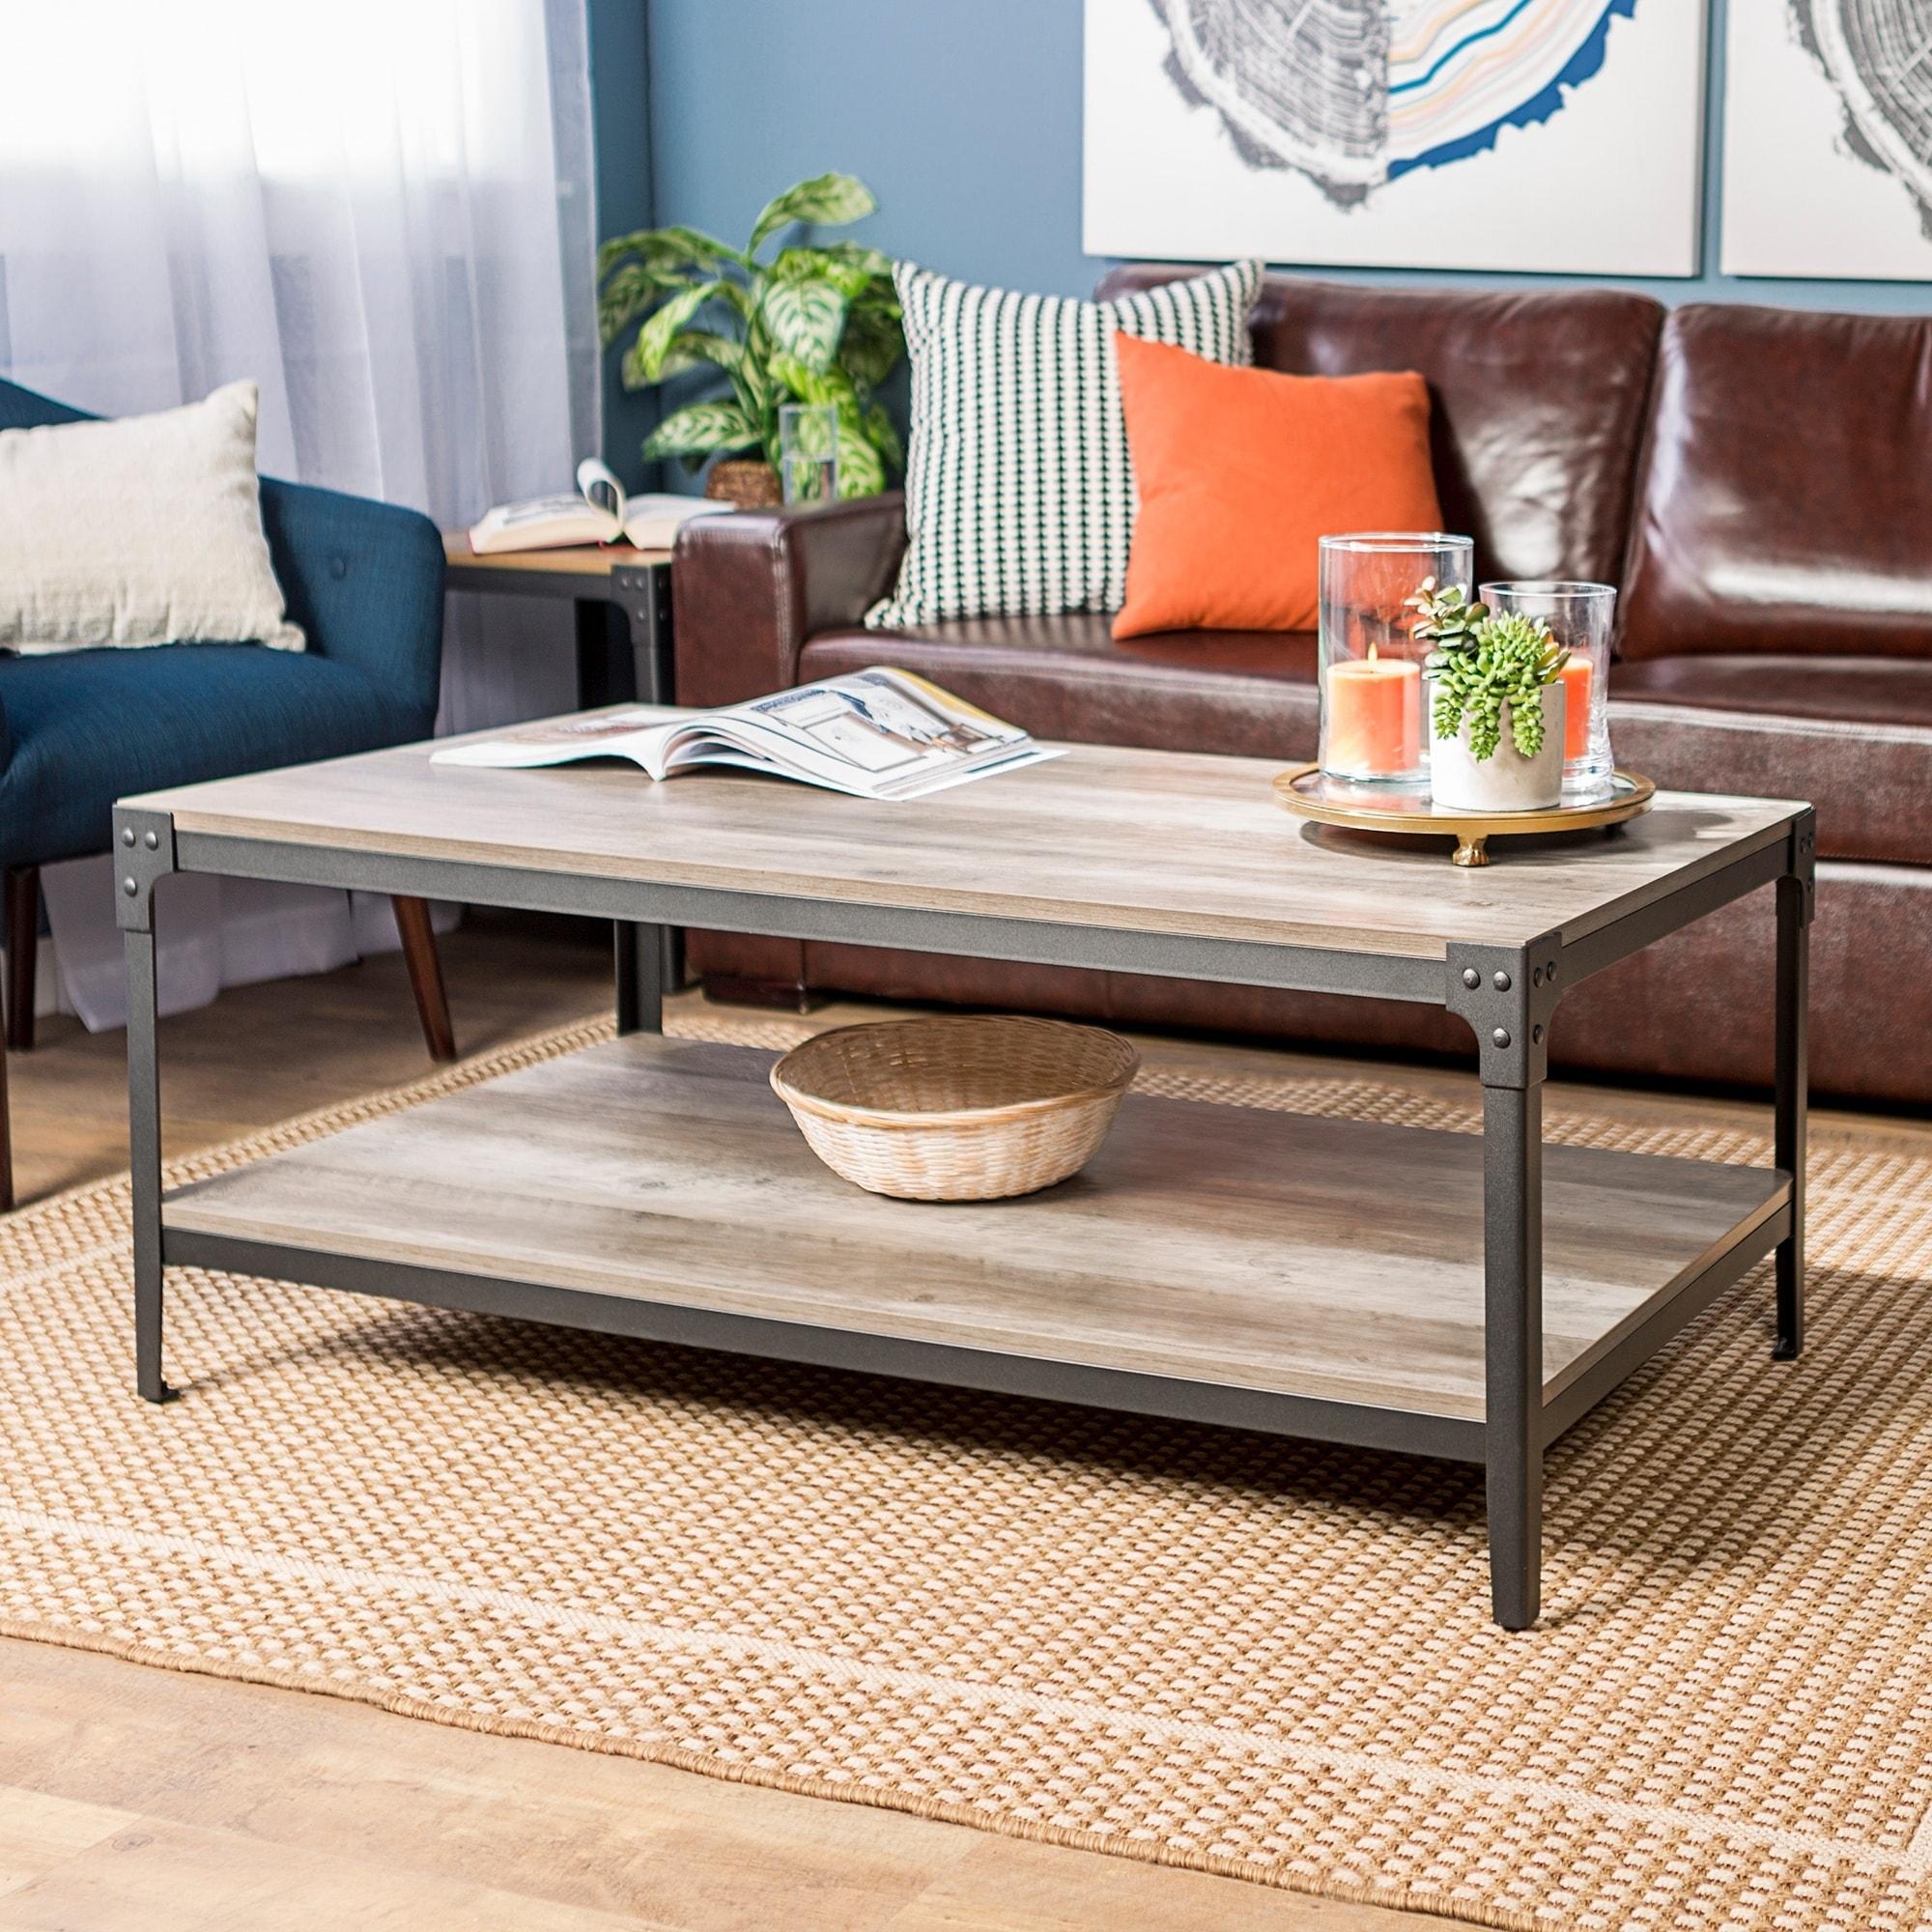 48-inch Rustic Angle Iron Coffee Table